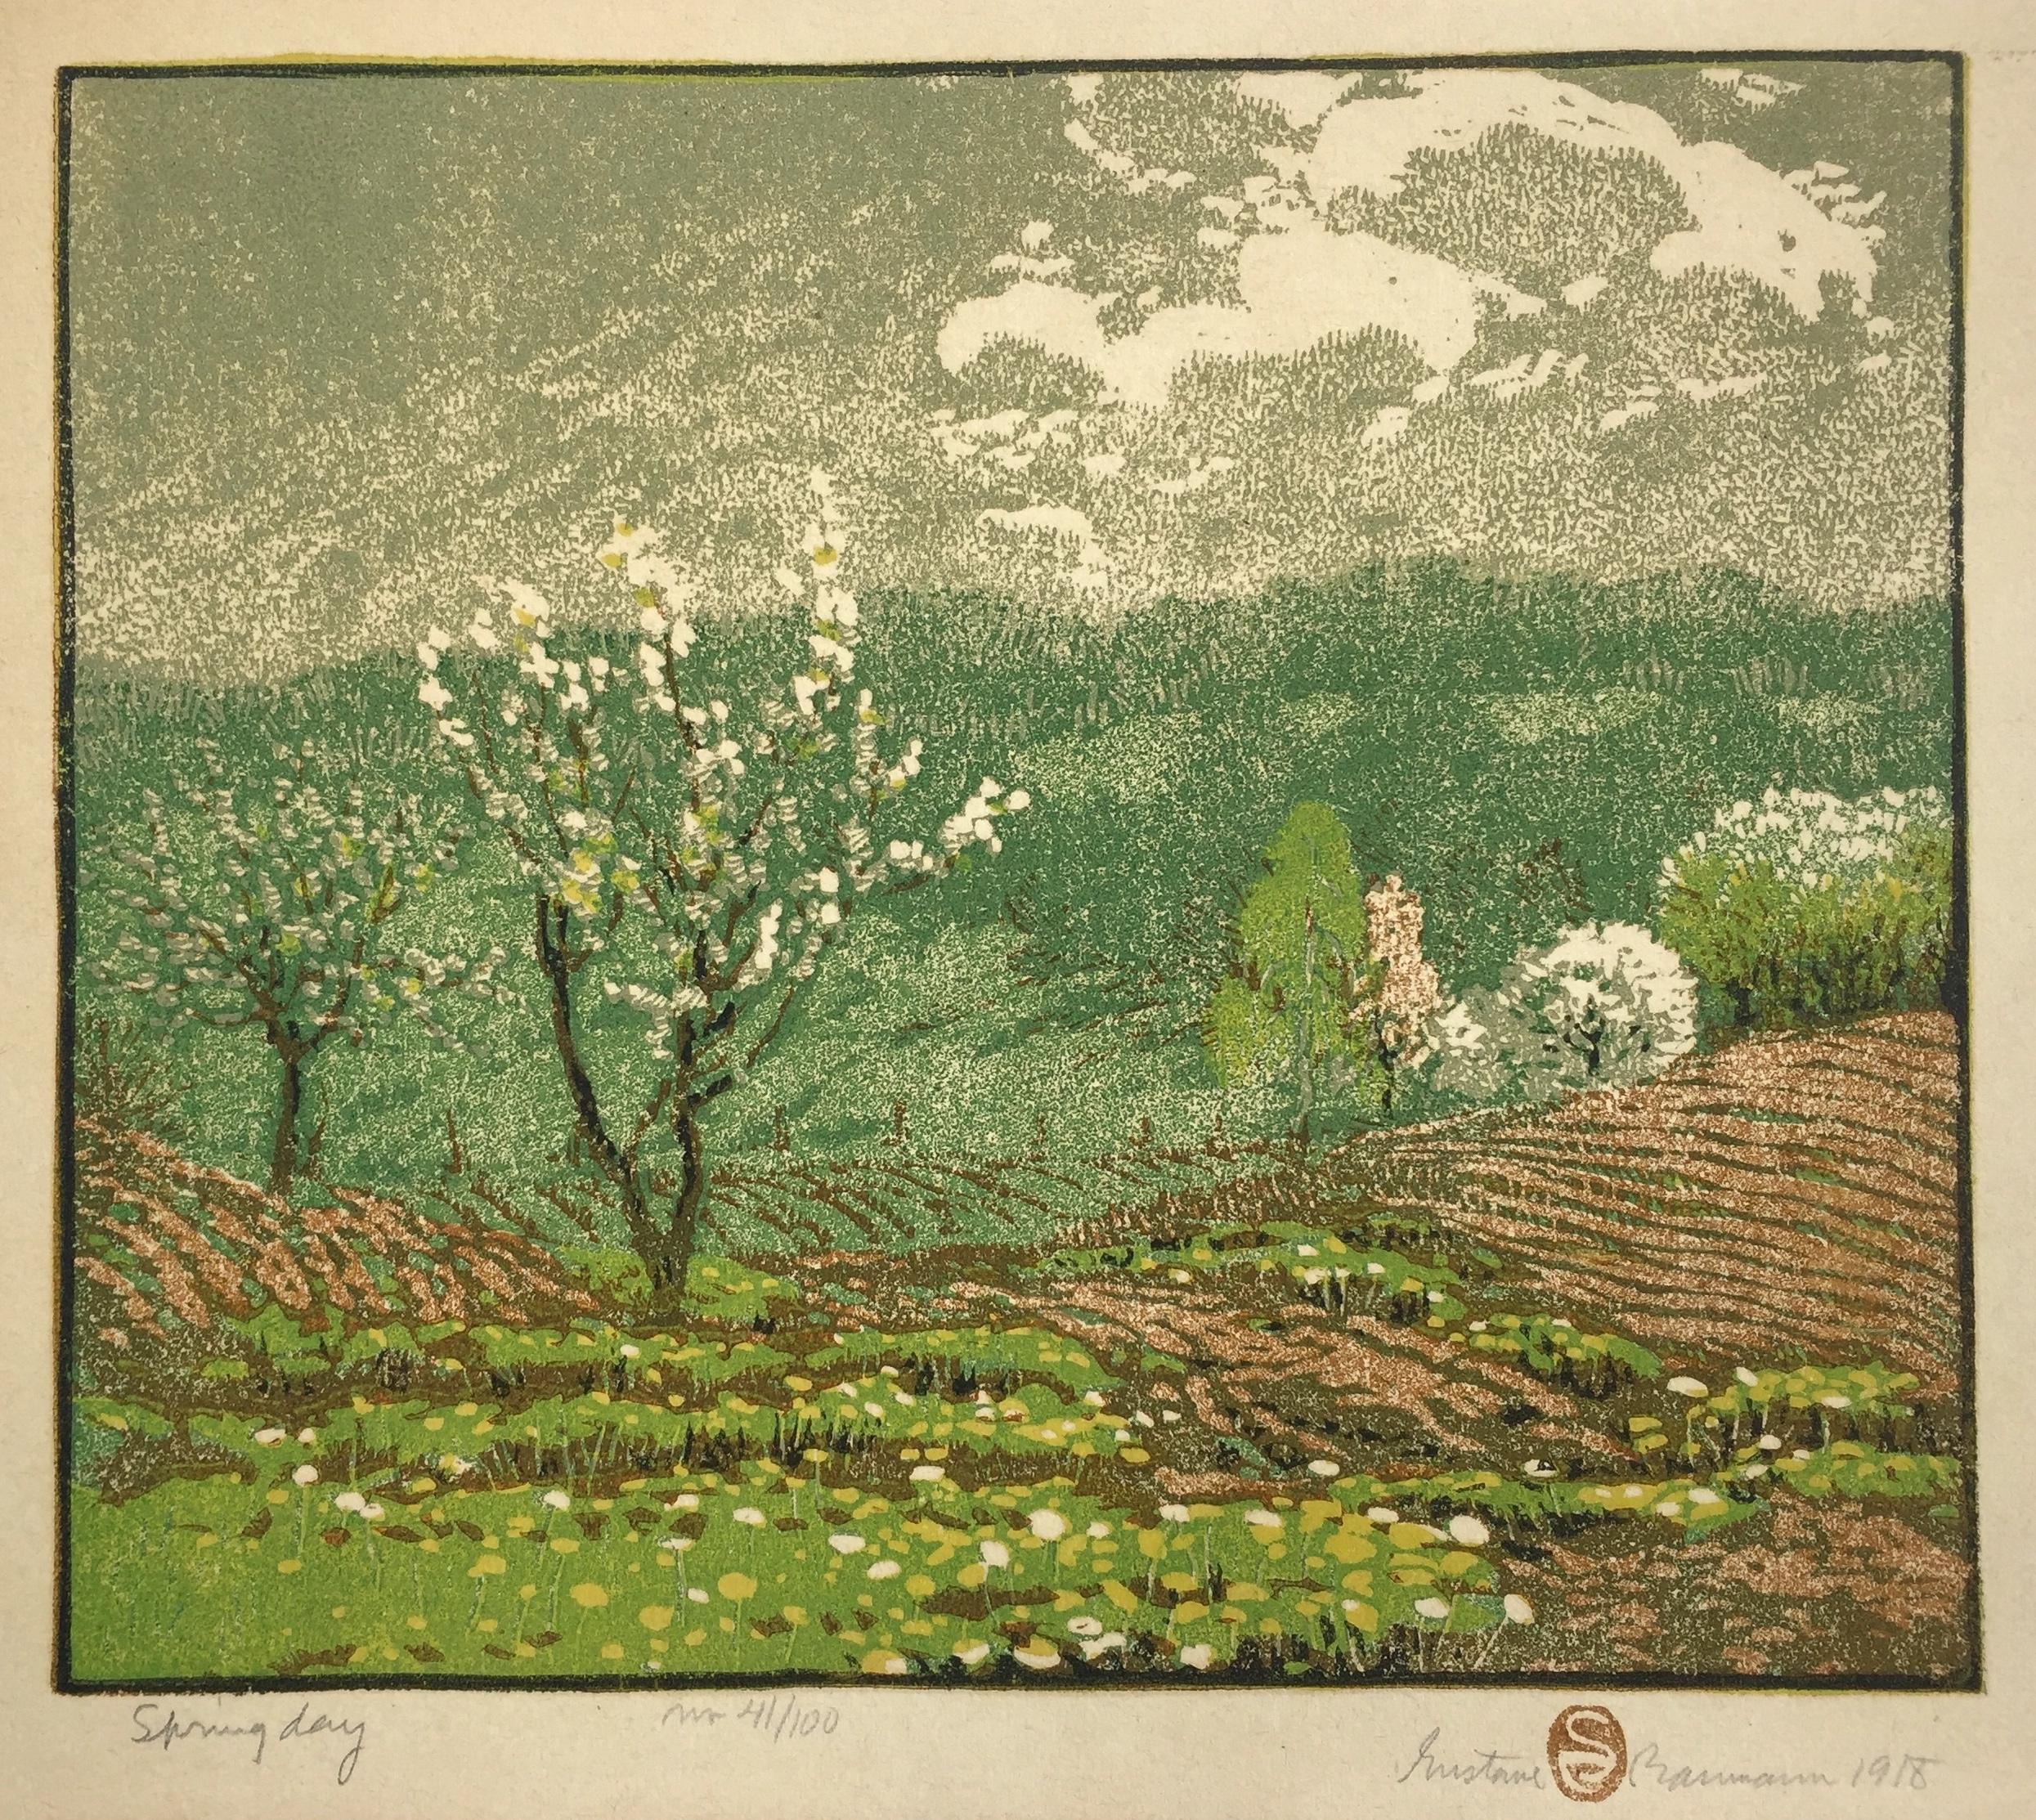 Baumann-Spring Day-cropped